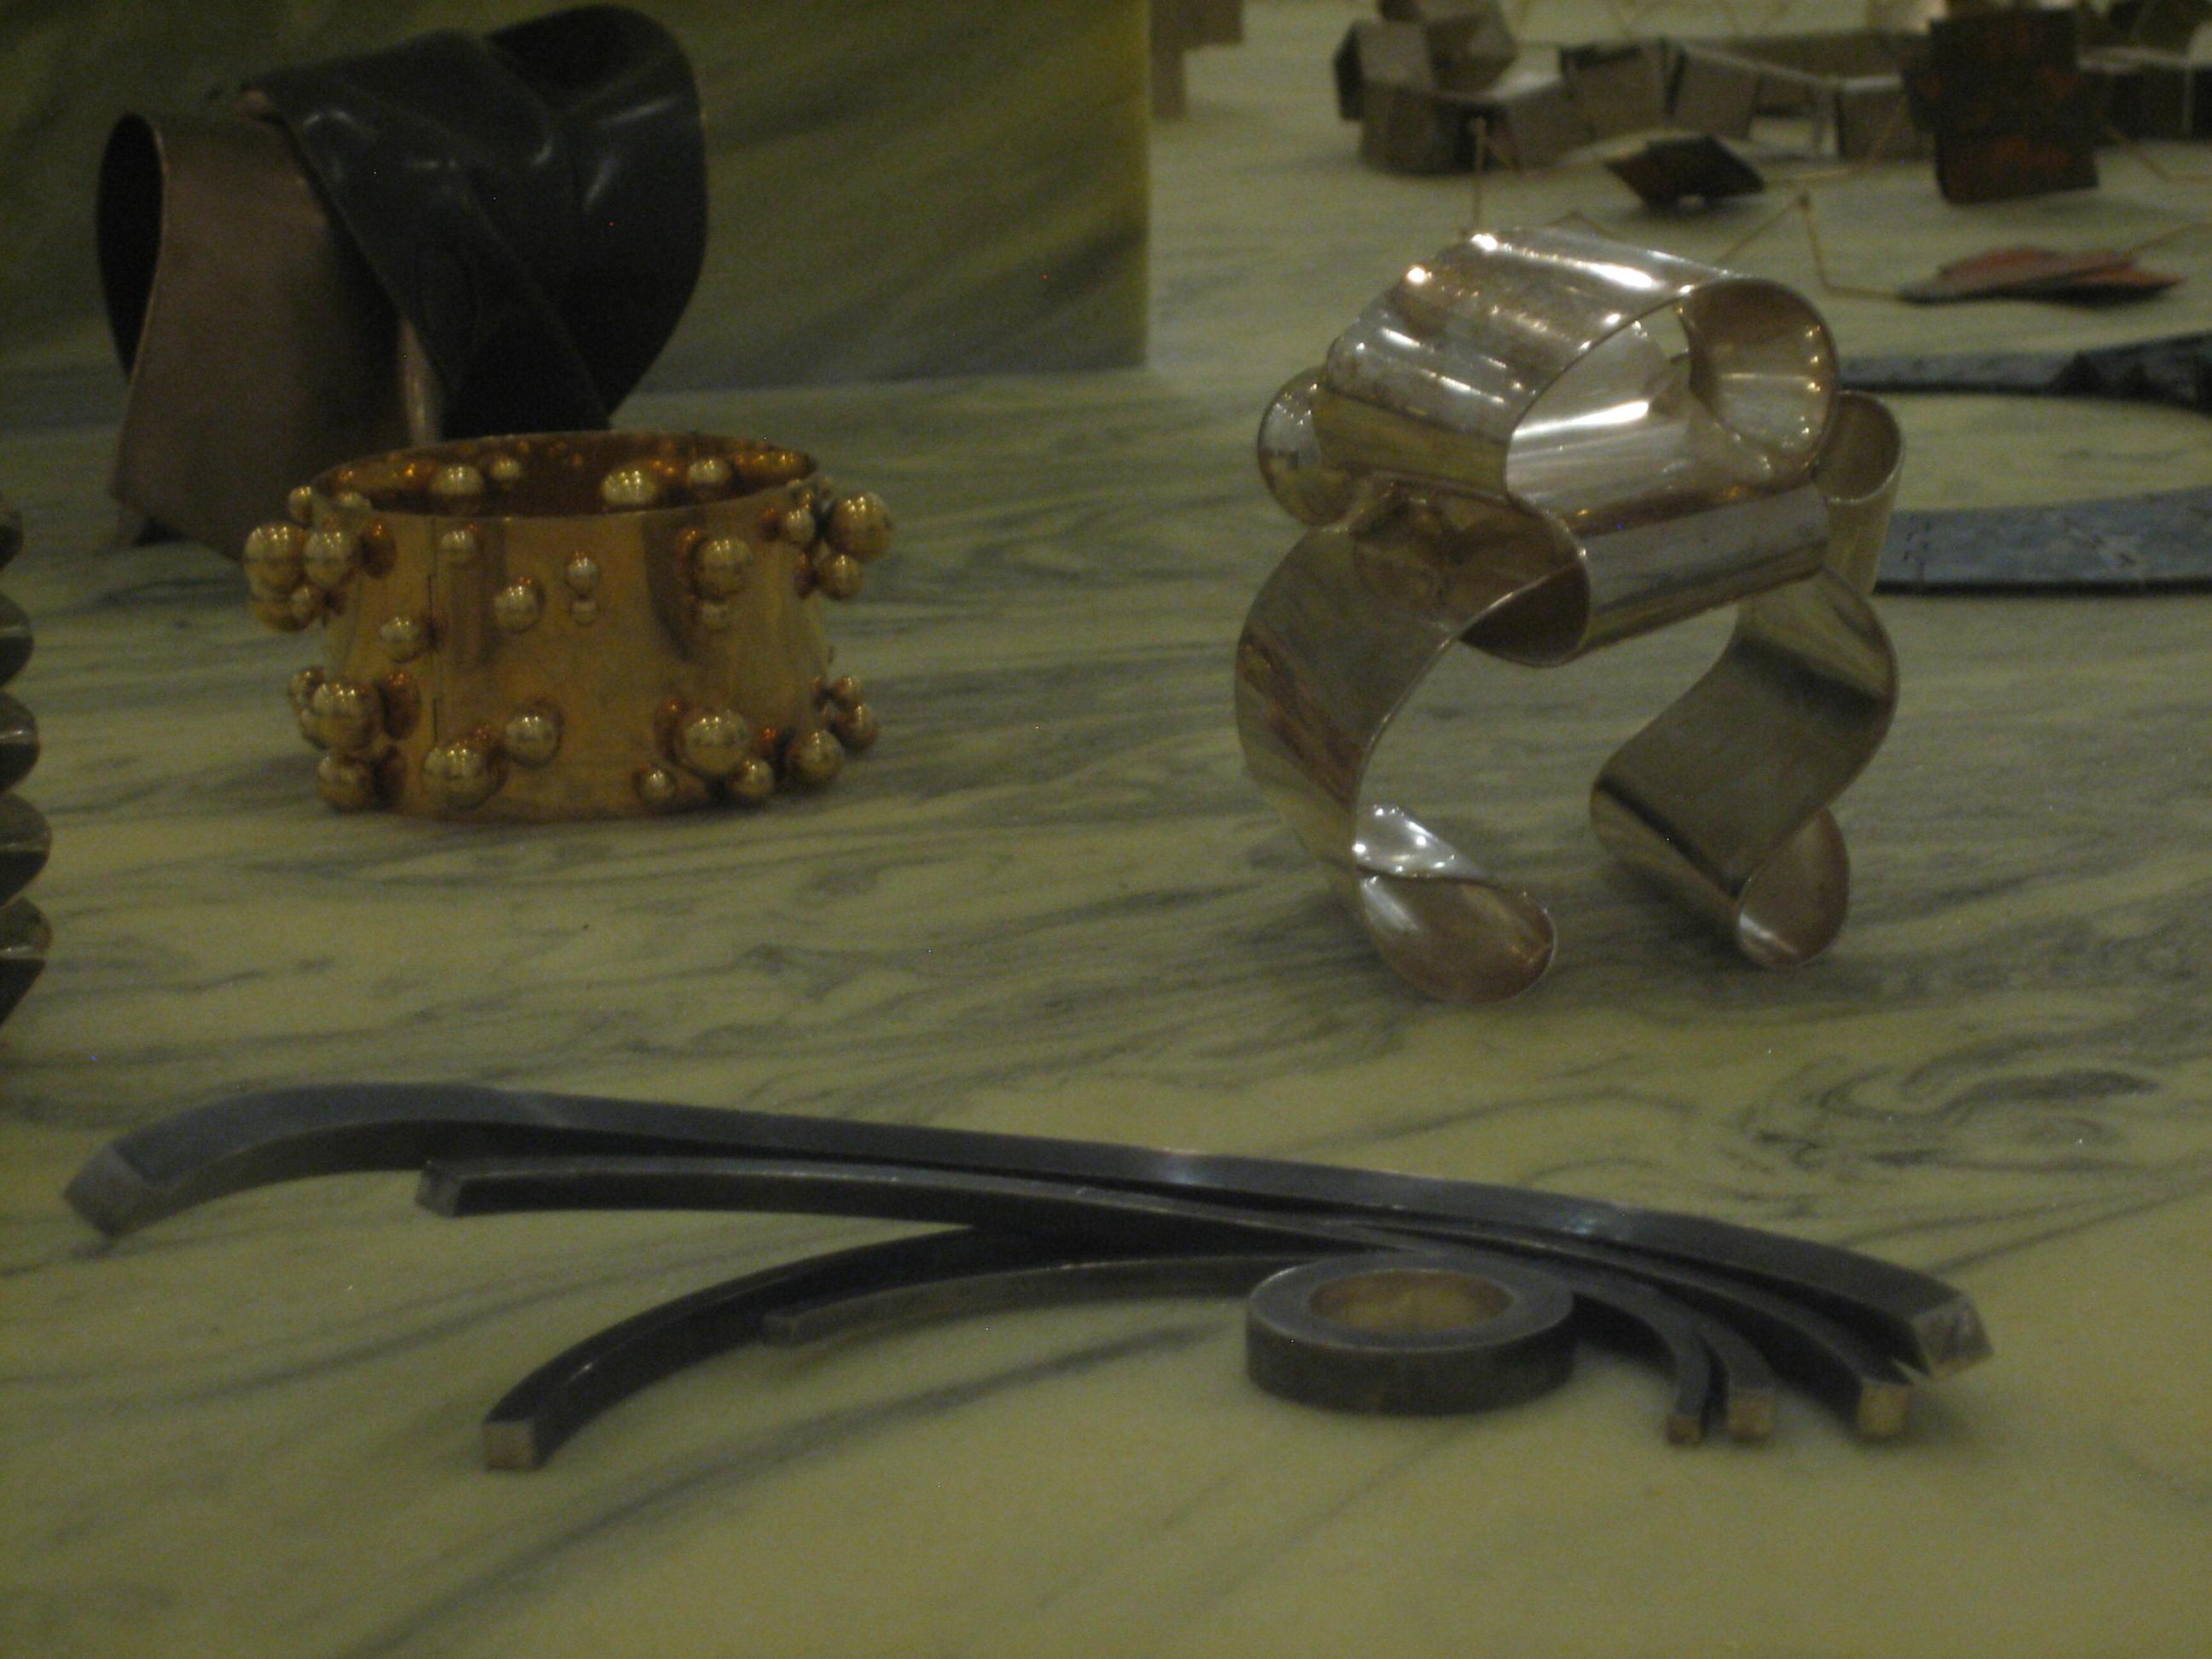 Pol Bury, armband, 1968, Alina Alamorean, Arc en Ciel, ring, 2012, Sophia Vari, Amazones, armband, 2011. Collectie S. Thierry-de Saint Rapt, tentoonstelling, metaal